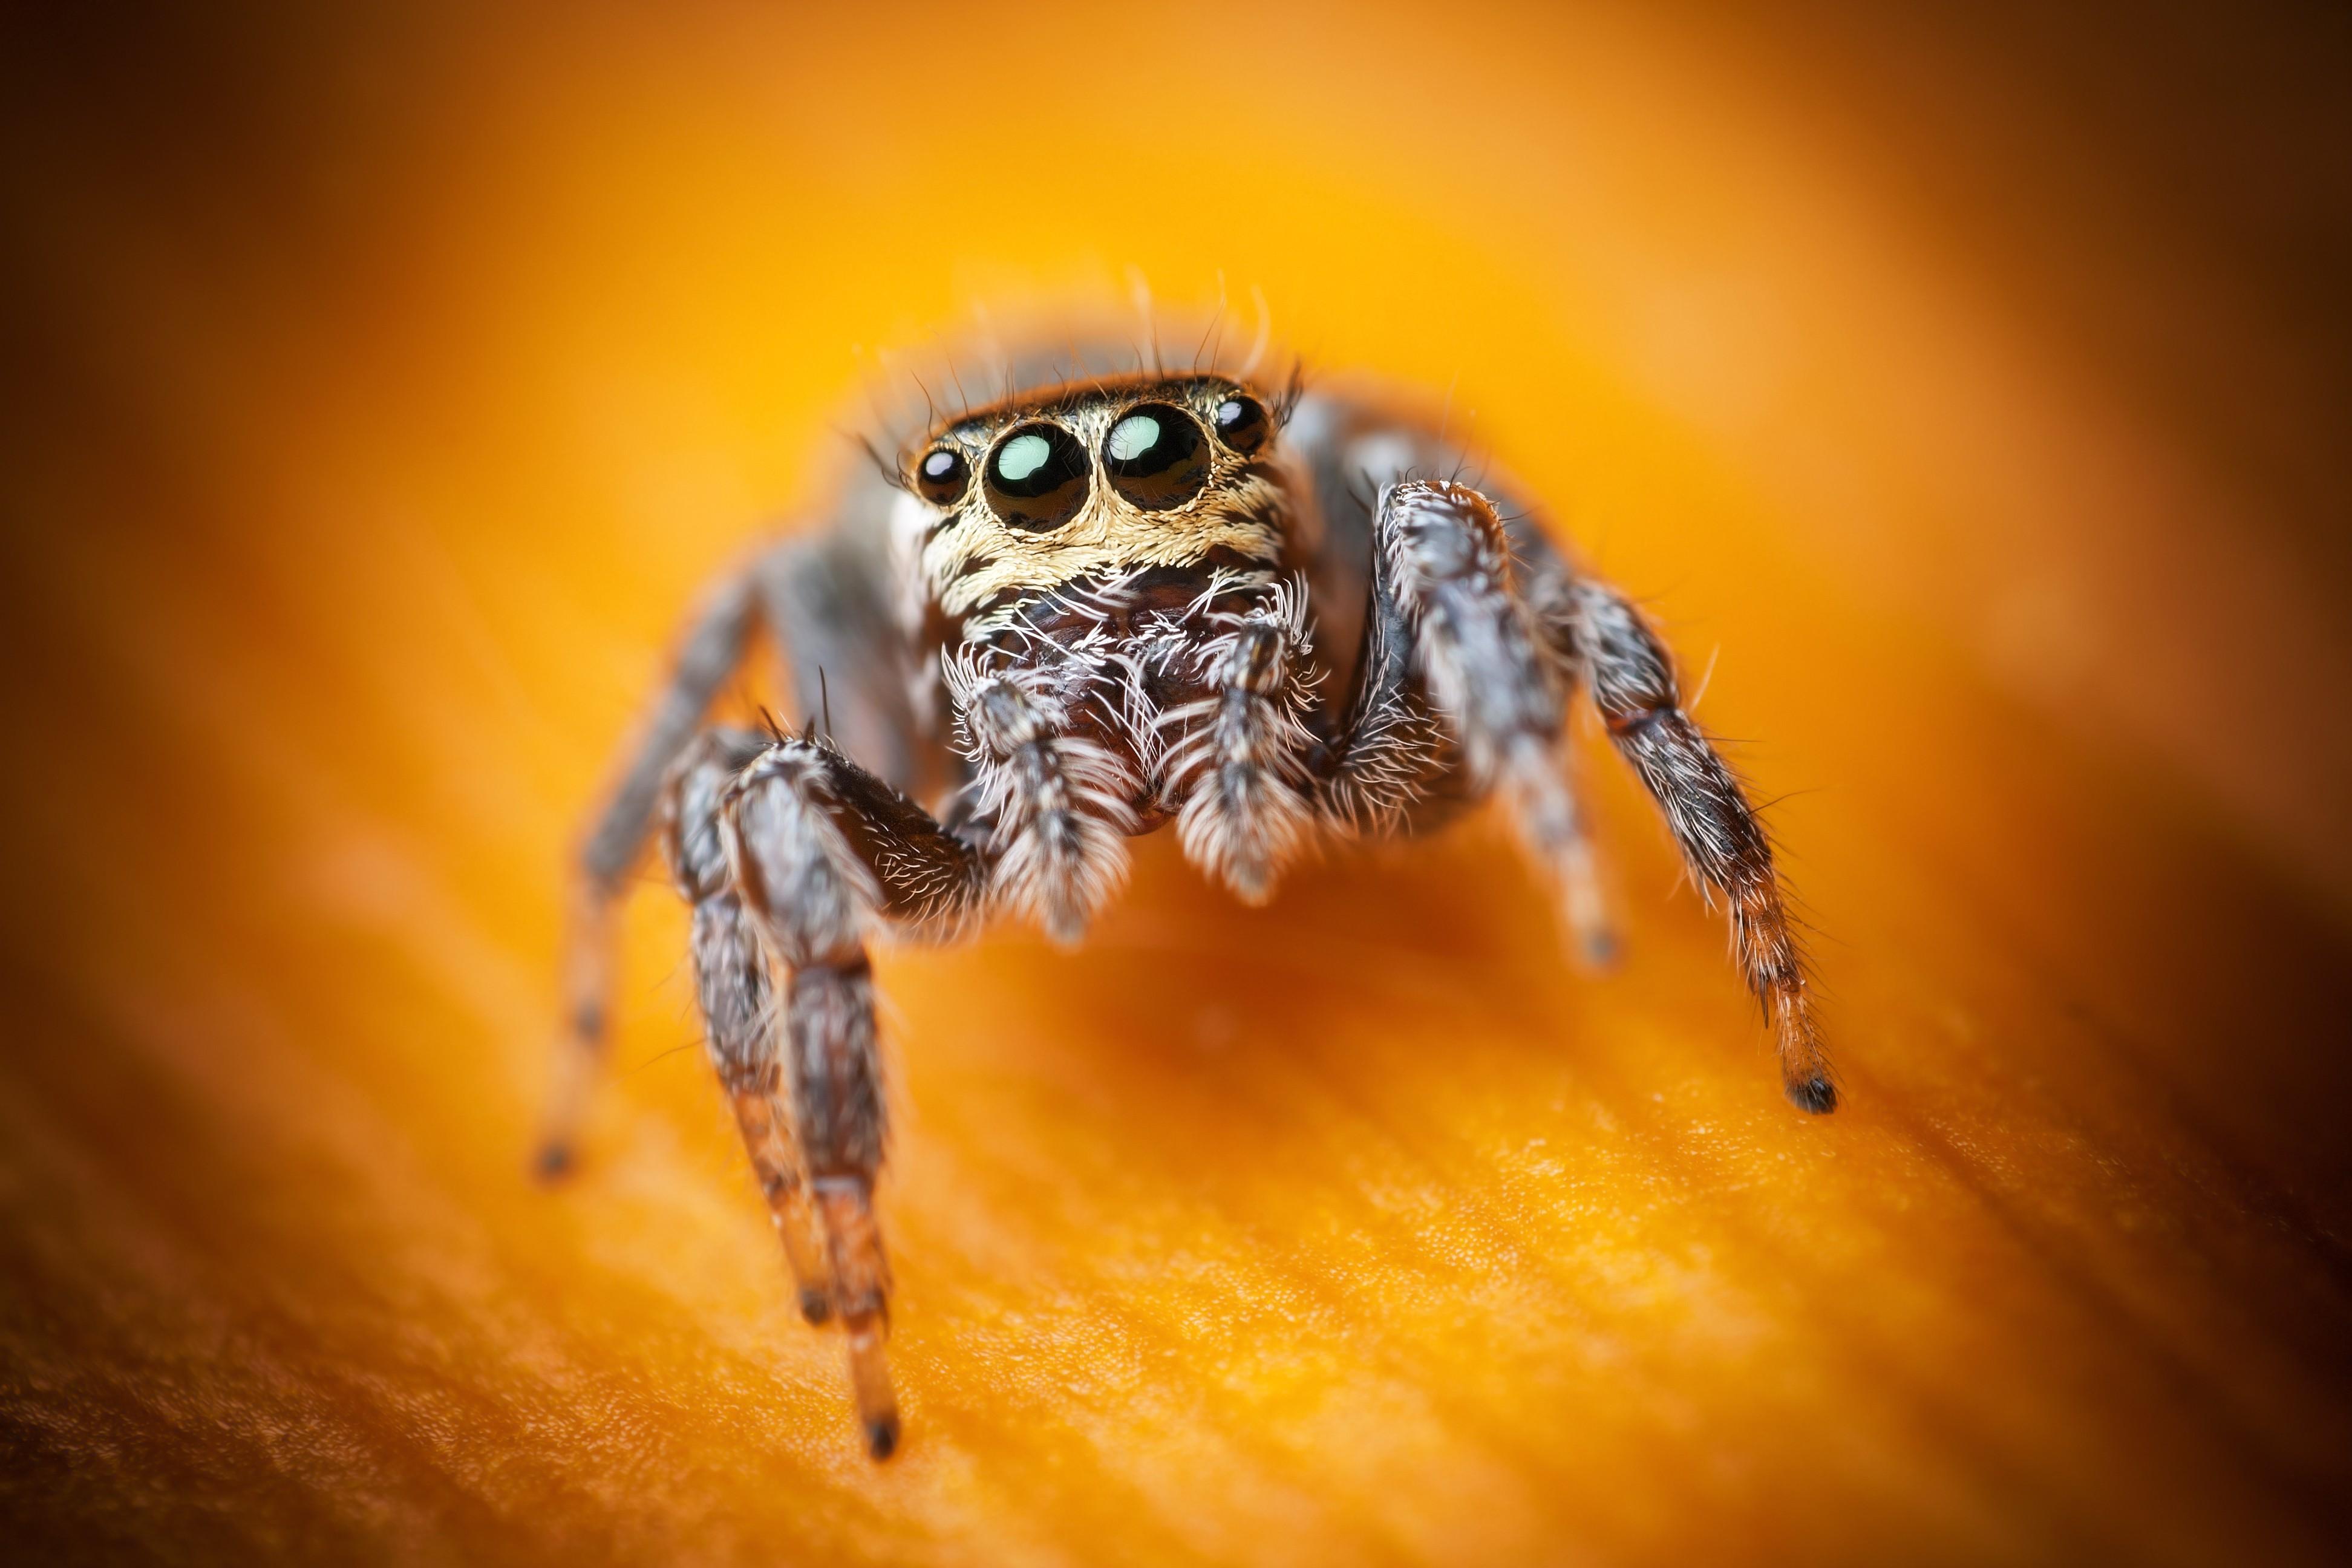 Custom Iphone X Wallpaper Wallpaper Jumping Spider Macro Black Eyes Yellow